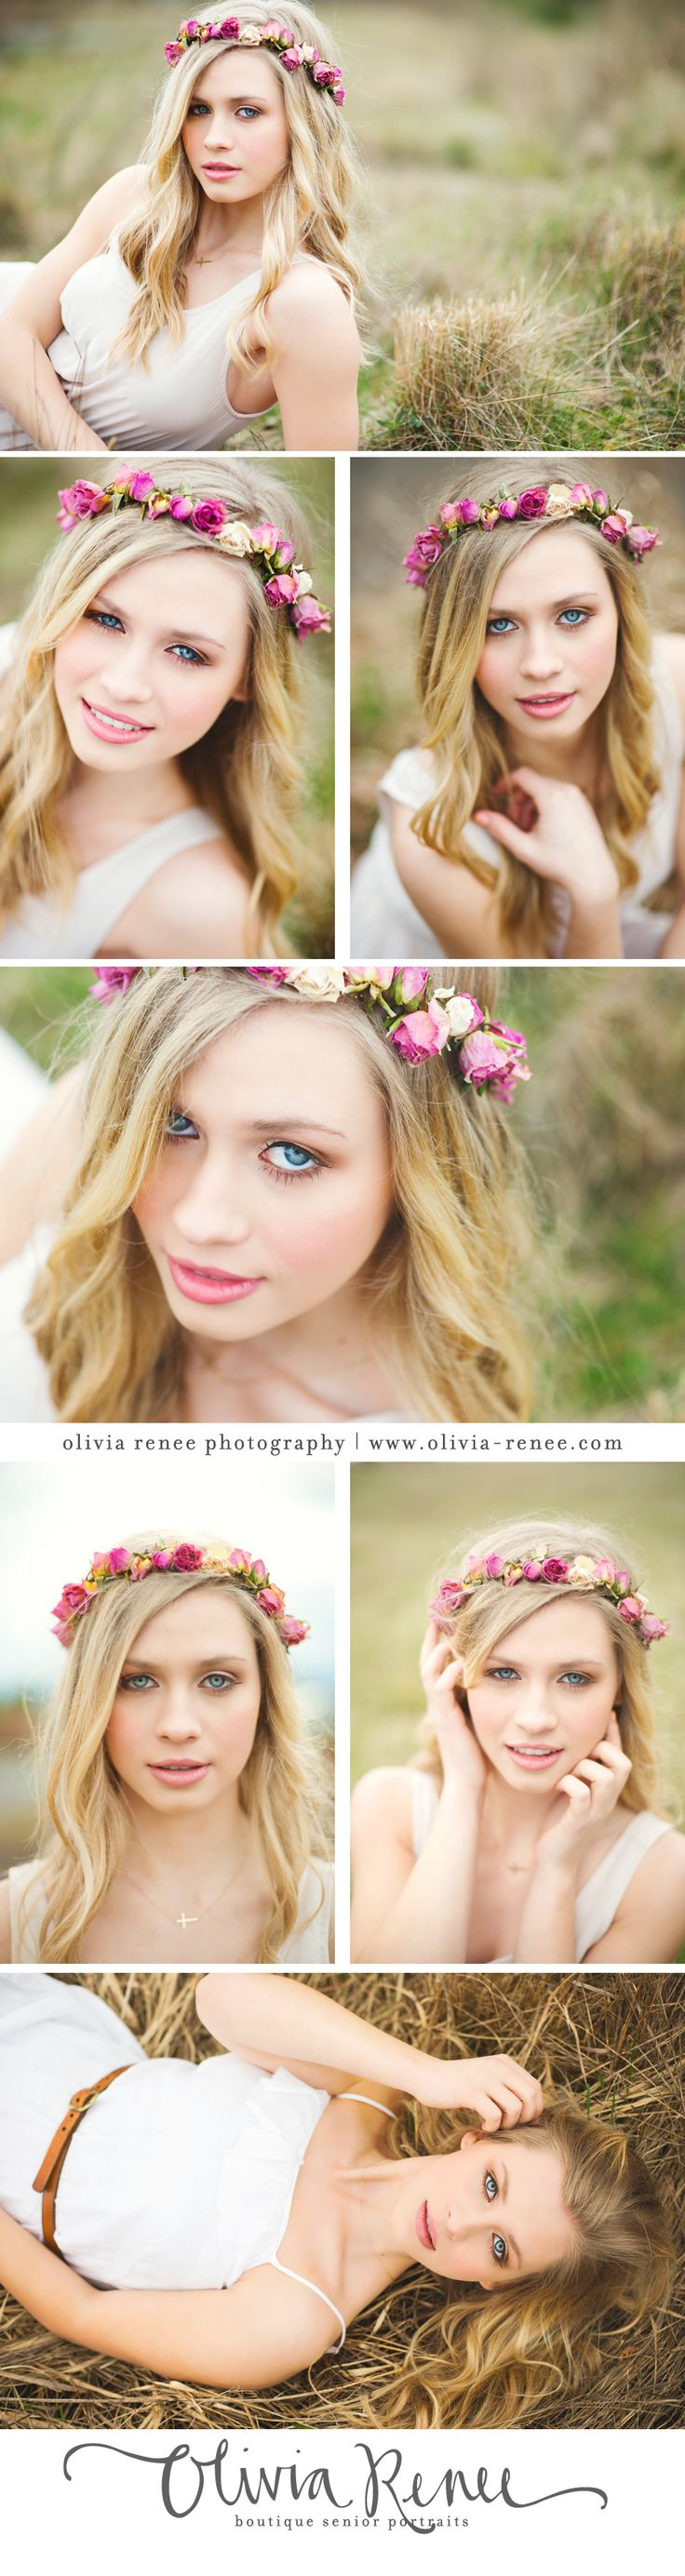 Isabelle | 2014 Senior Spokesmodel | Central Catholic High School » Olivia Renee Photography | Boutique Senior Portraits